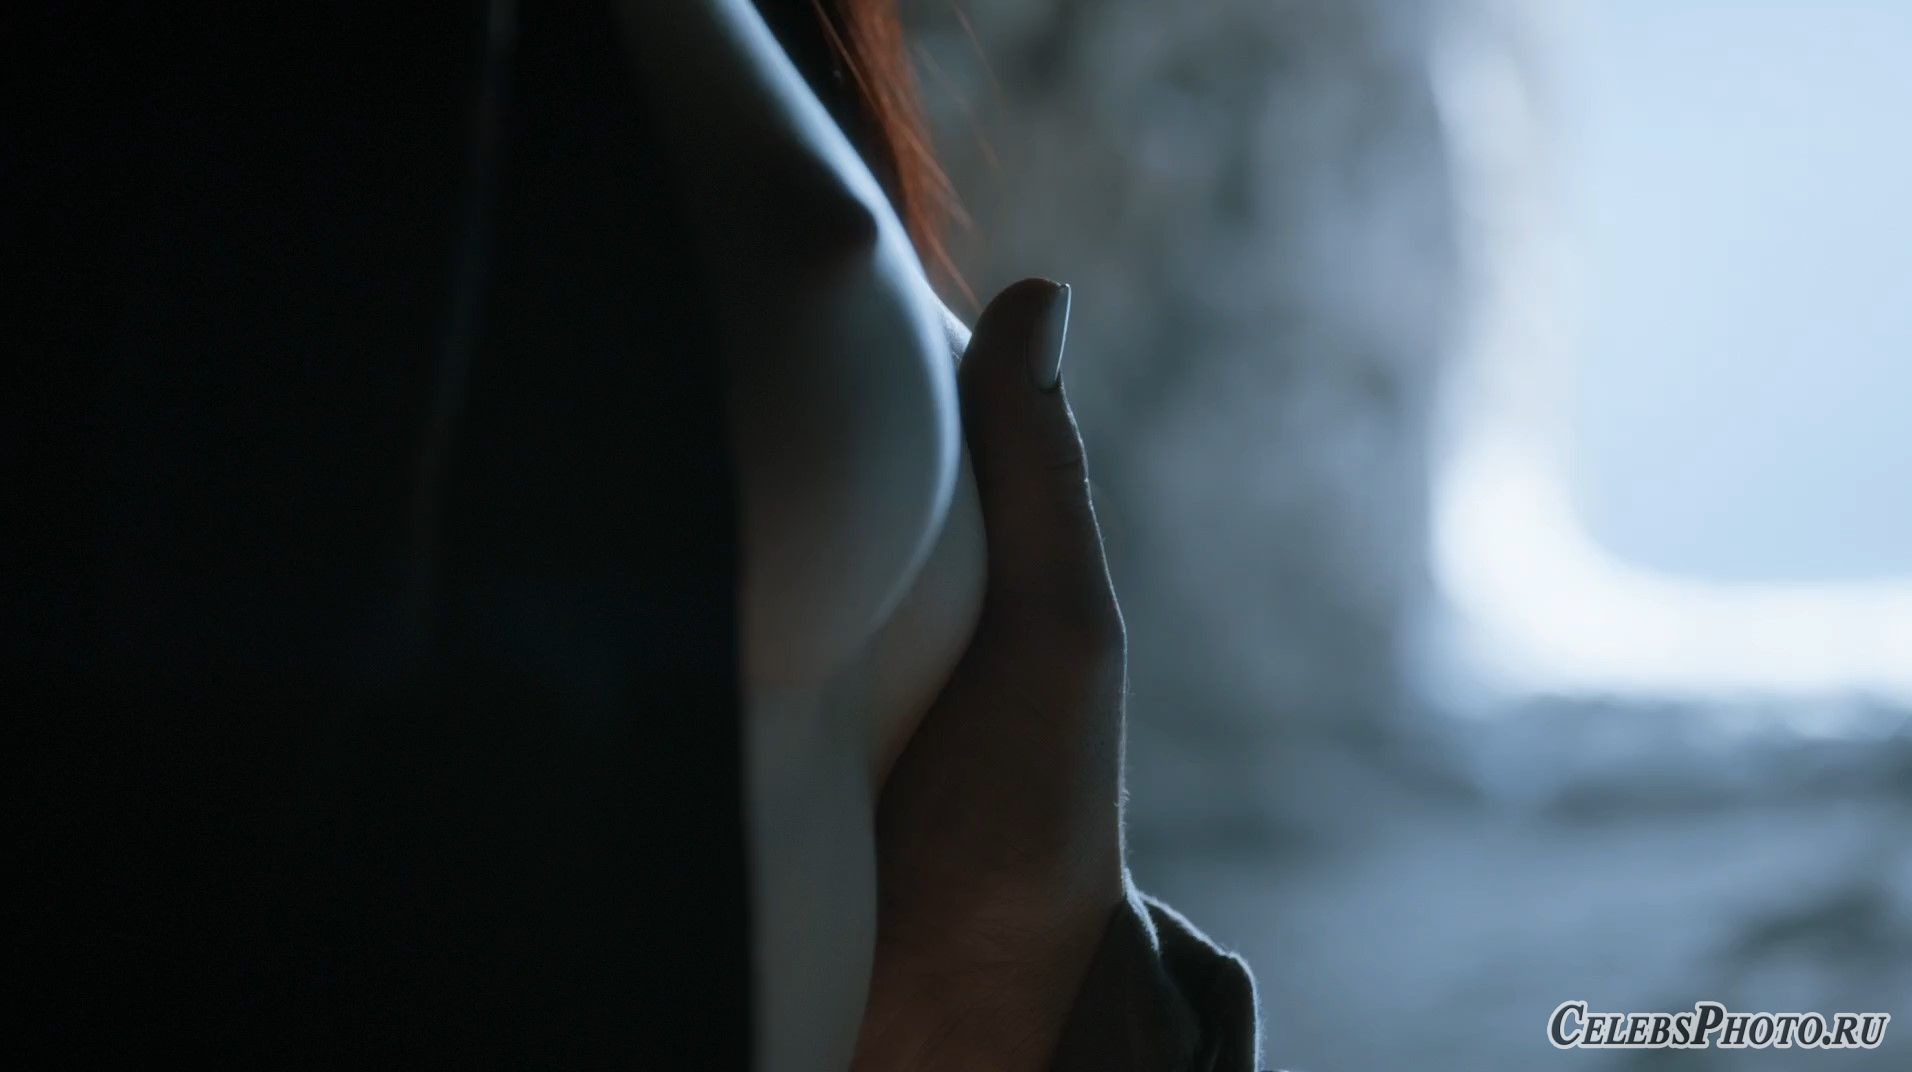 Игра престолов – Кэрис ван Хаутен